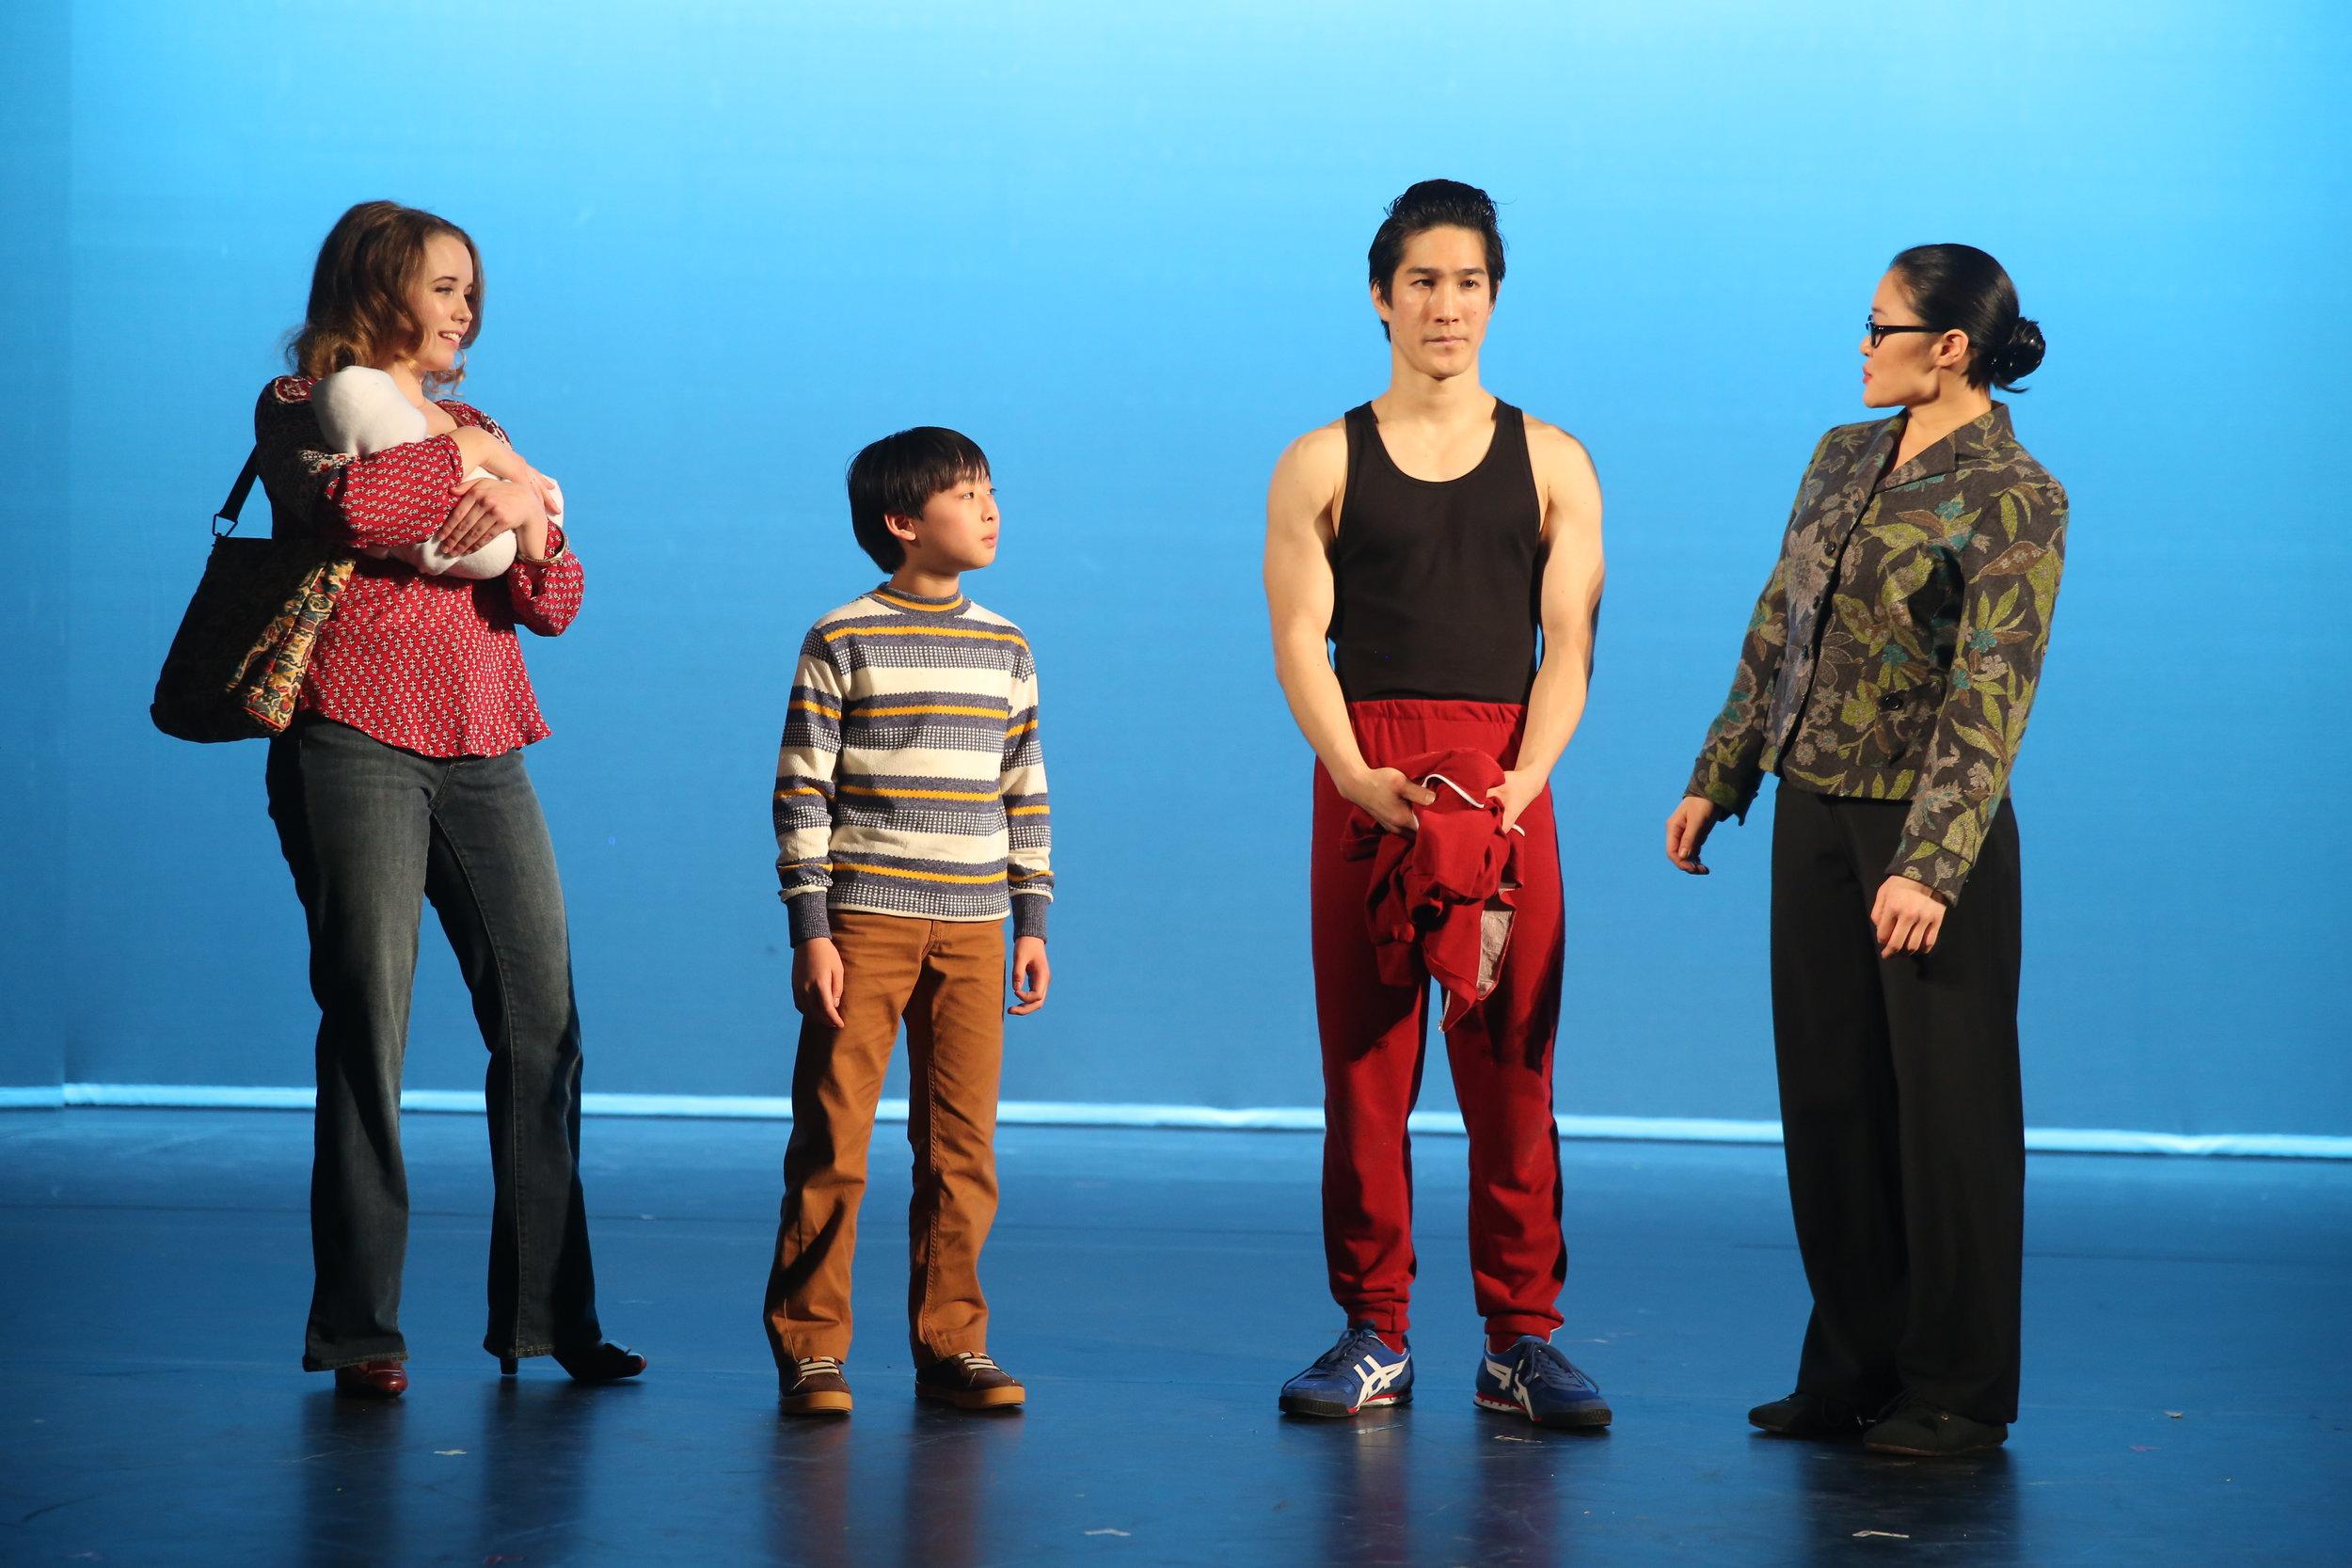 Phoebe Strole, Bradley Fong, Cole Horibe, 和 Kristin Faith Oei。 图片来源: Joan Marcus,署名剧院,2014